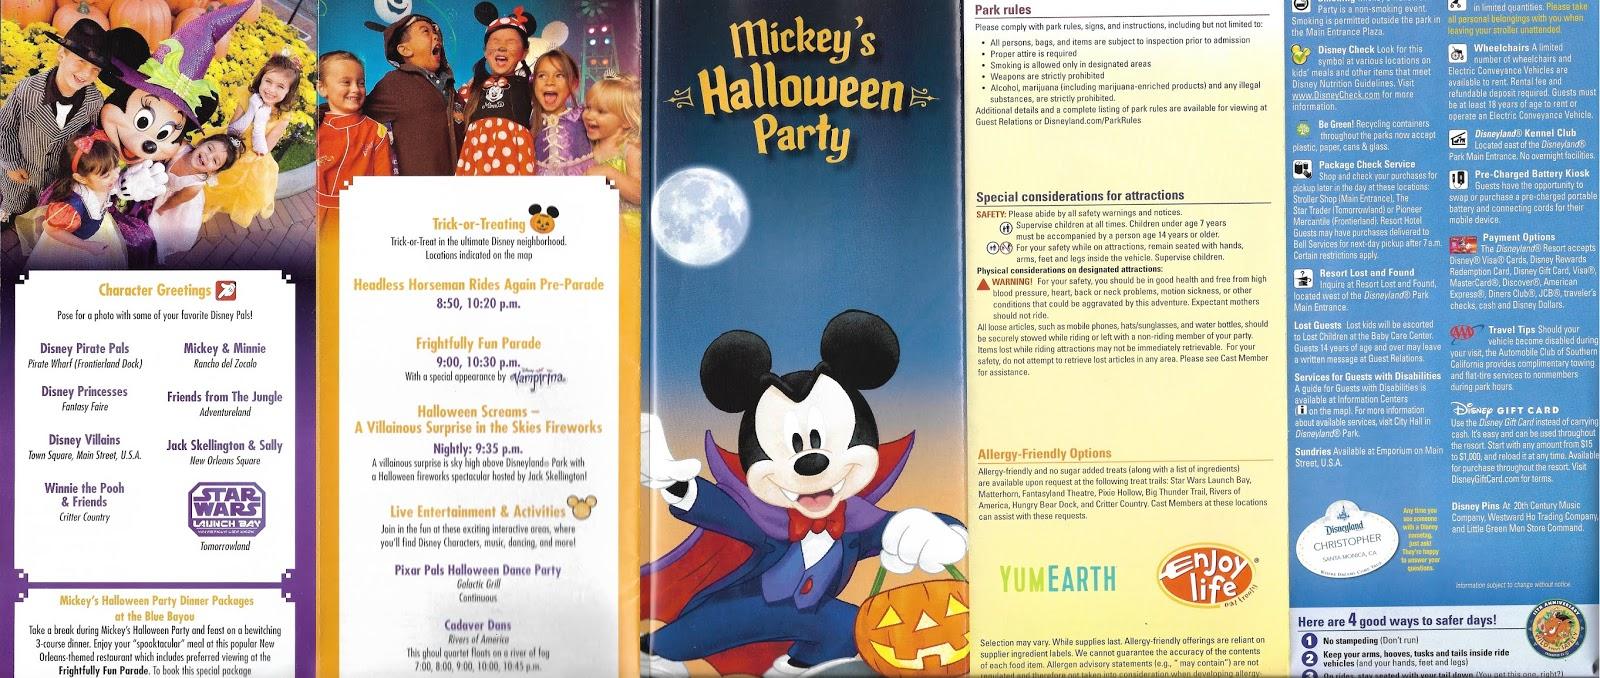 Disneyland 2018 Mickey's Halloween Party | WirelessPhreak